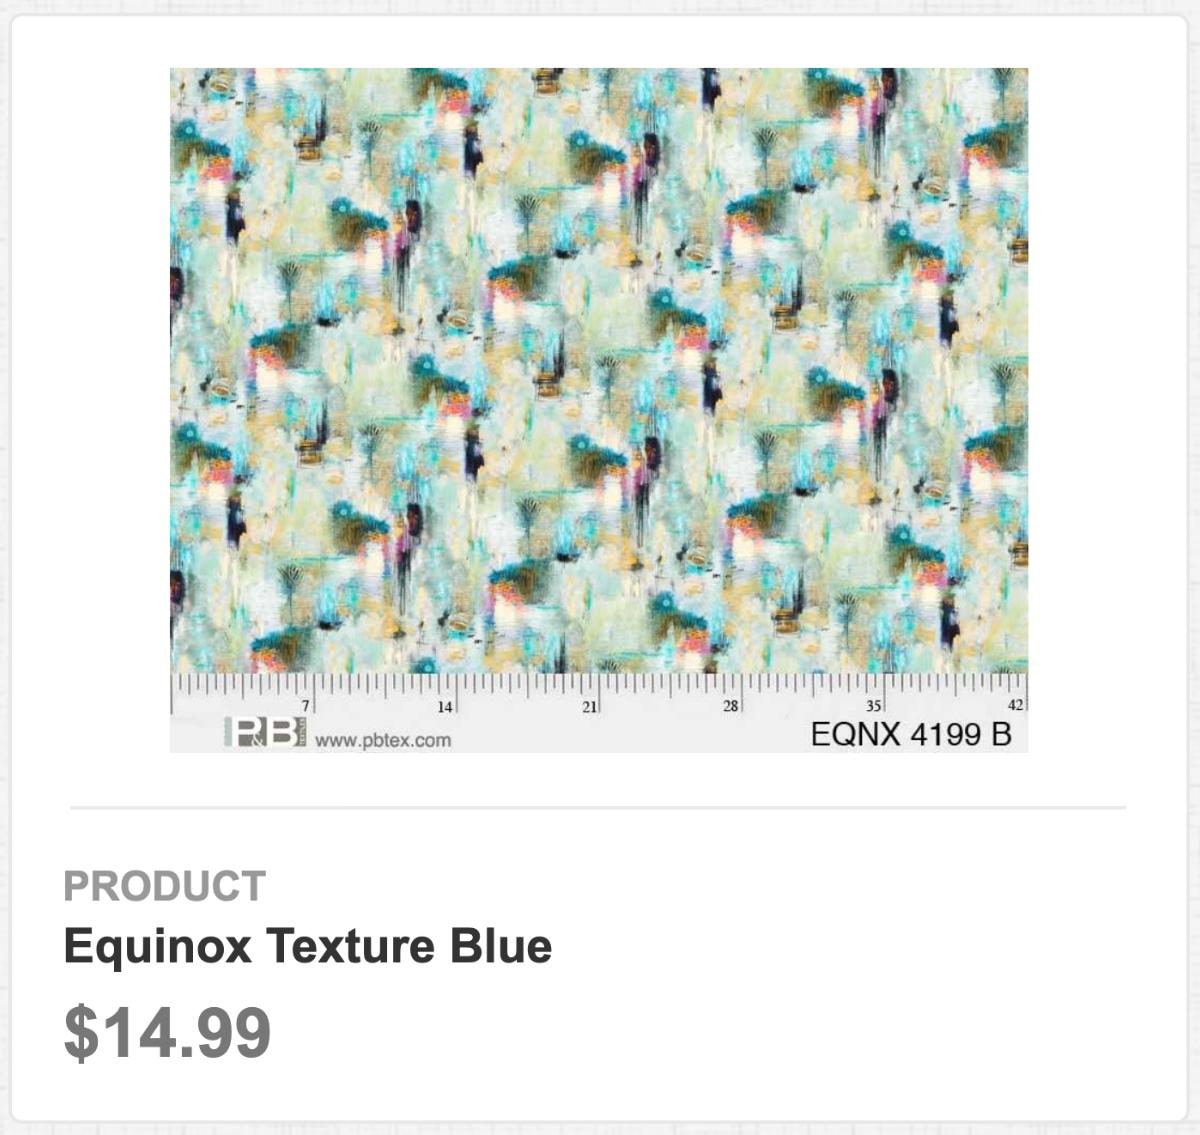 Equinox Texture Blue